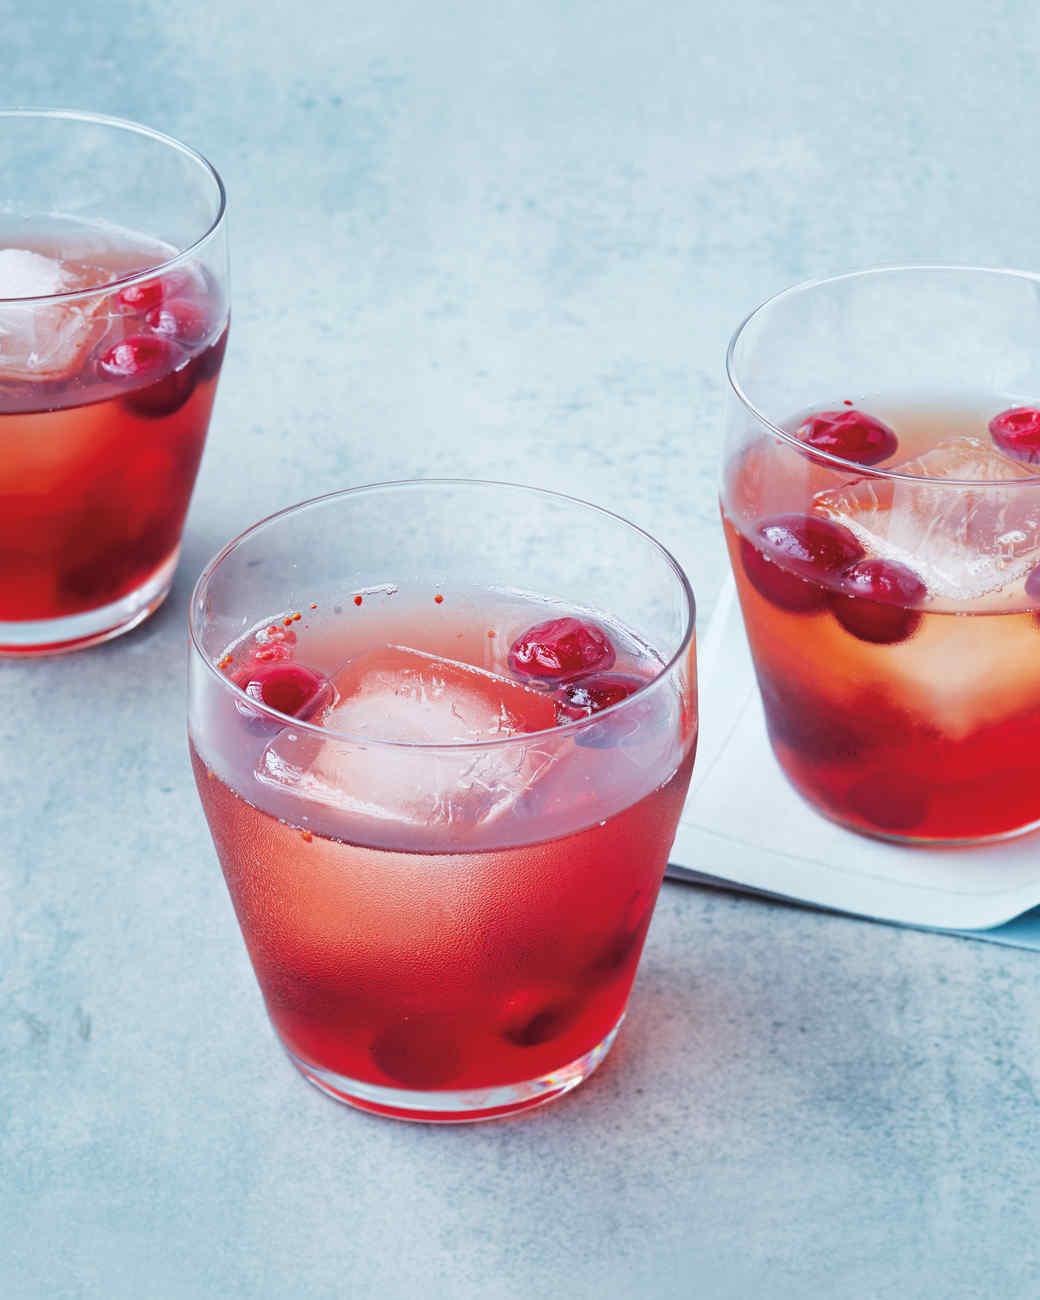 cranberry-shrub-cocktail-0388-d111547.jpg